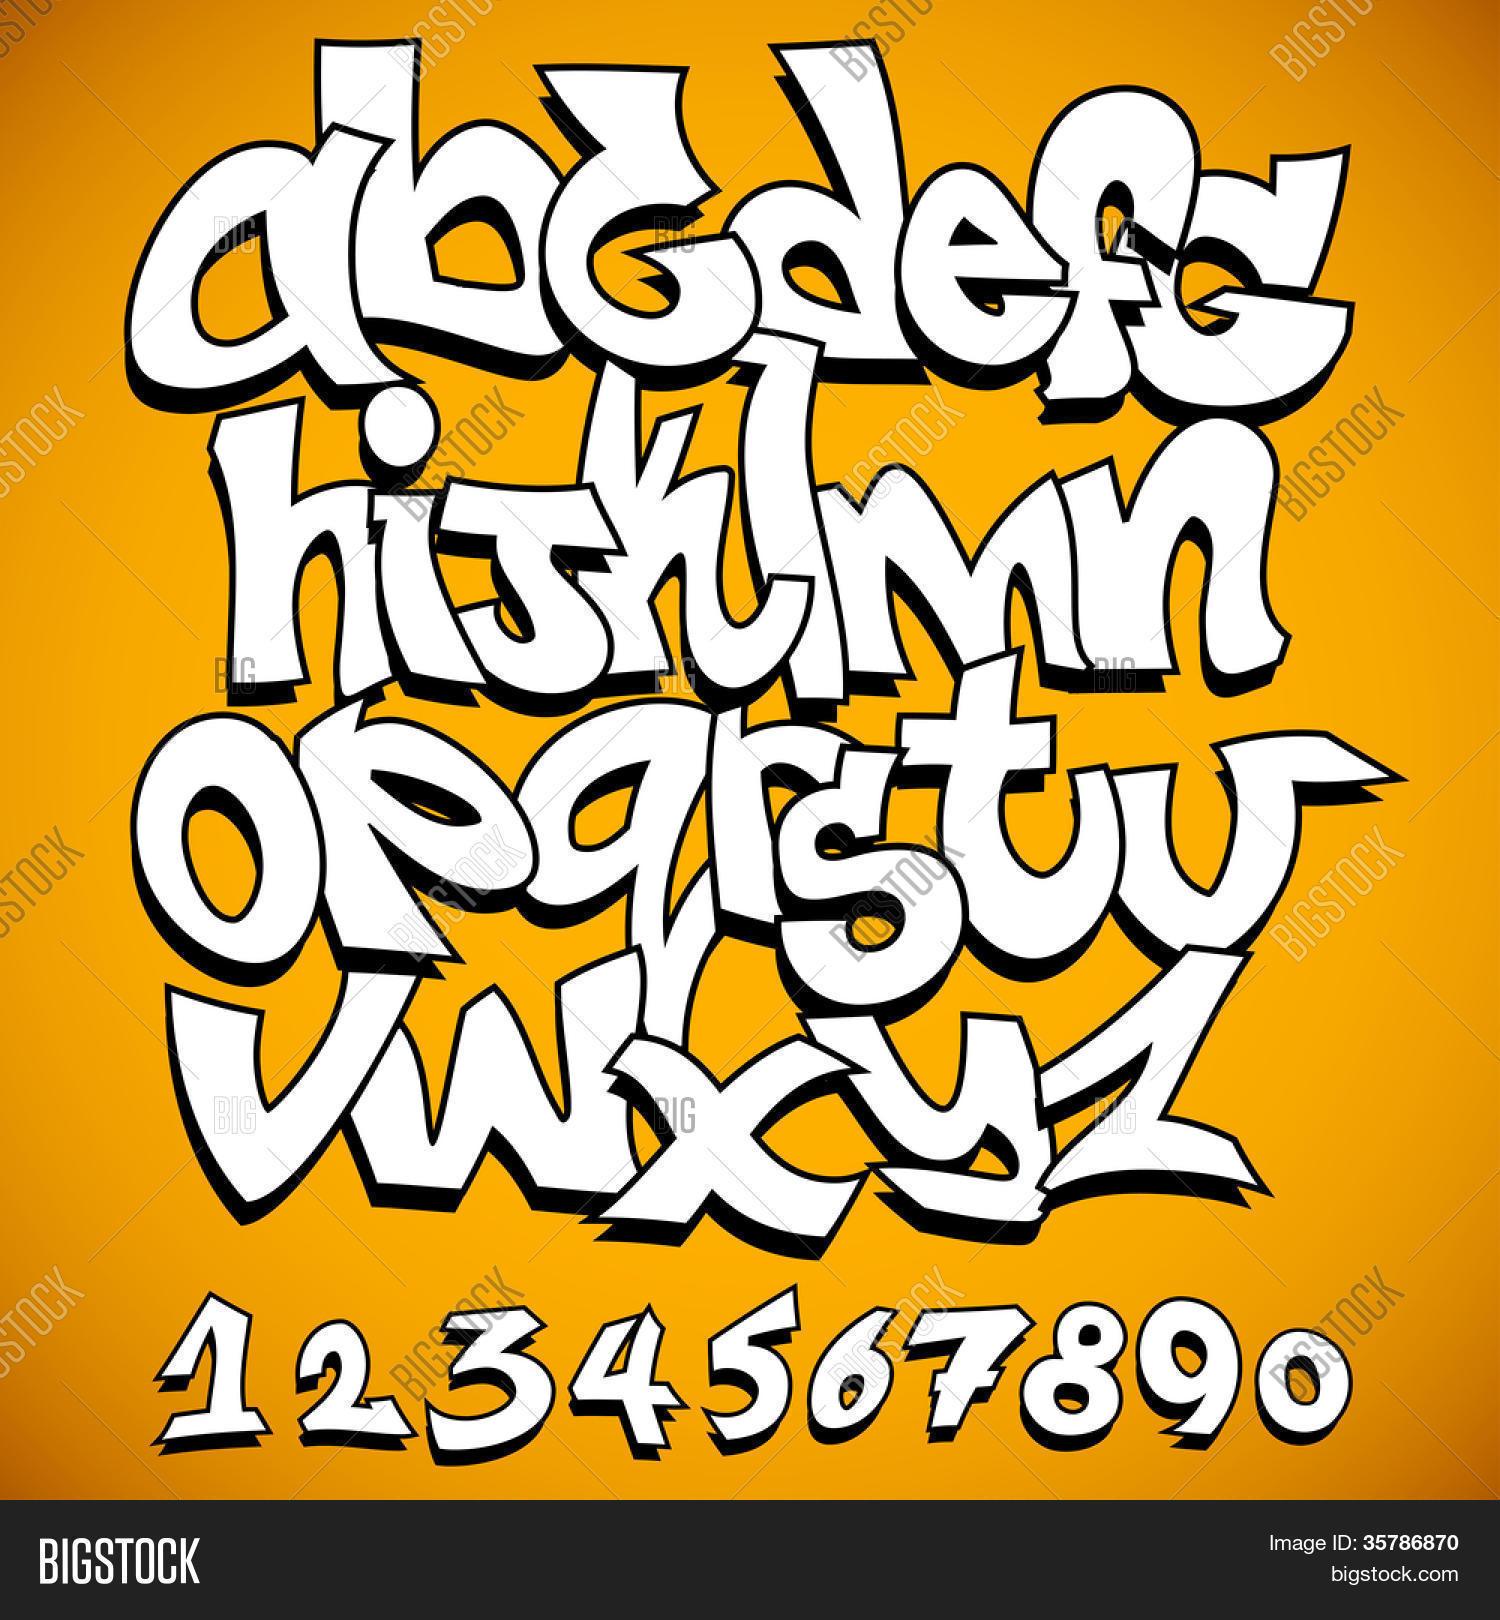 Graffiti Font Vector & Photo (Free Trial) | Bigstock